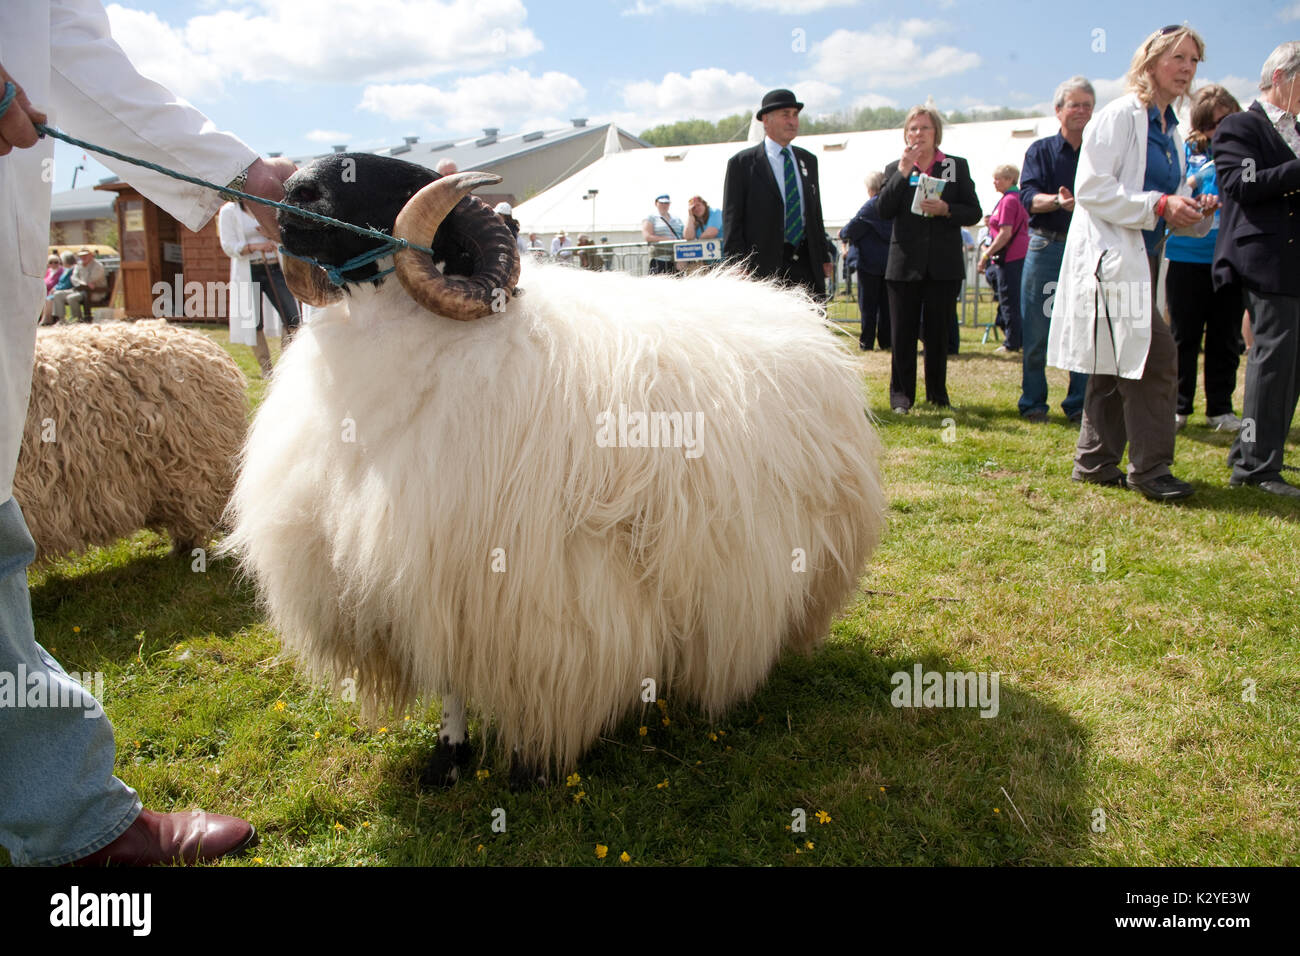 Devon County Show 2009, Judging sheep, - Stock Image